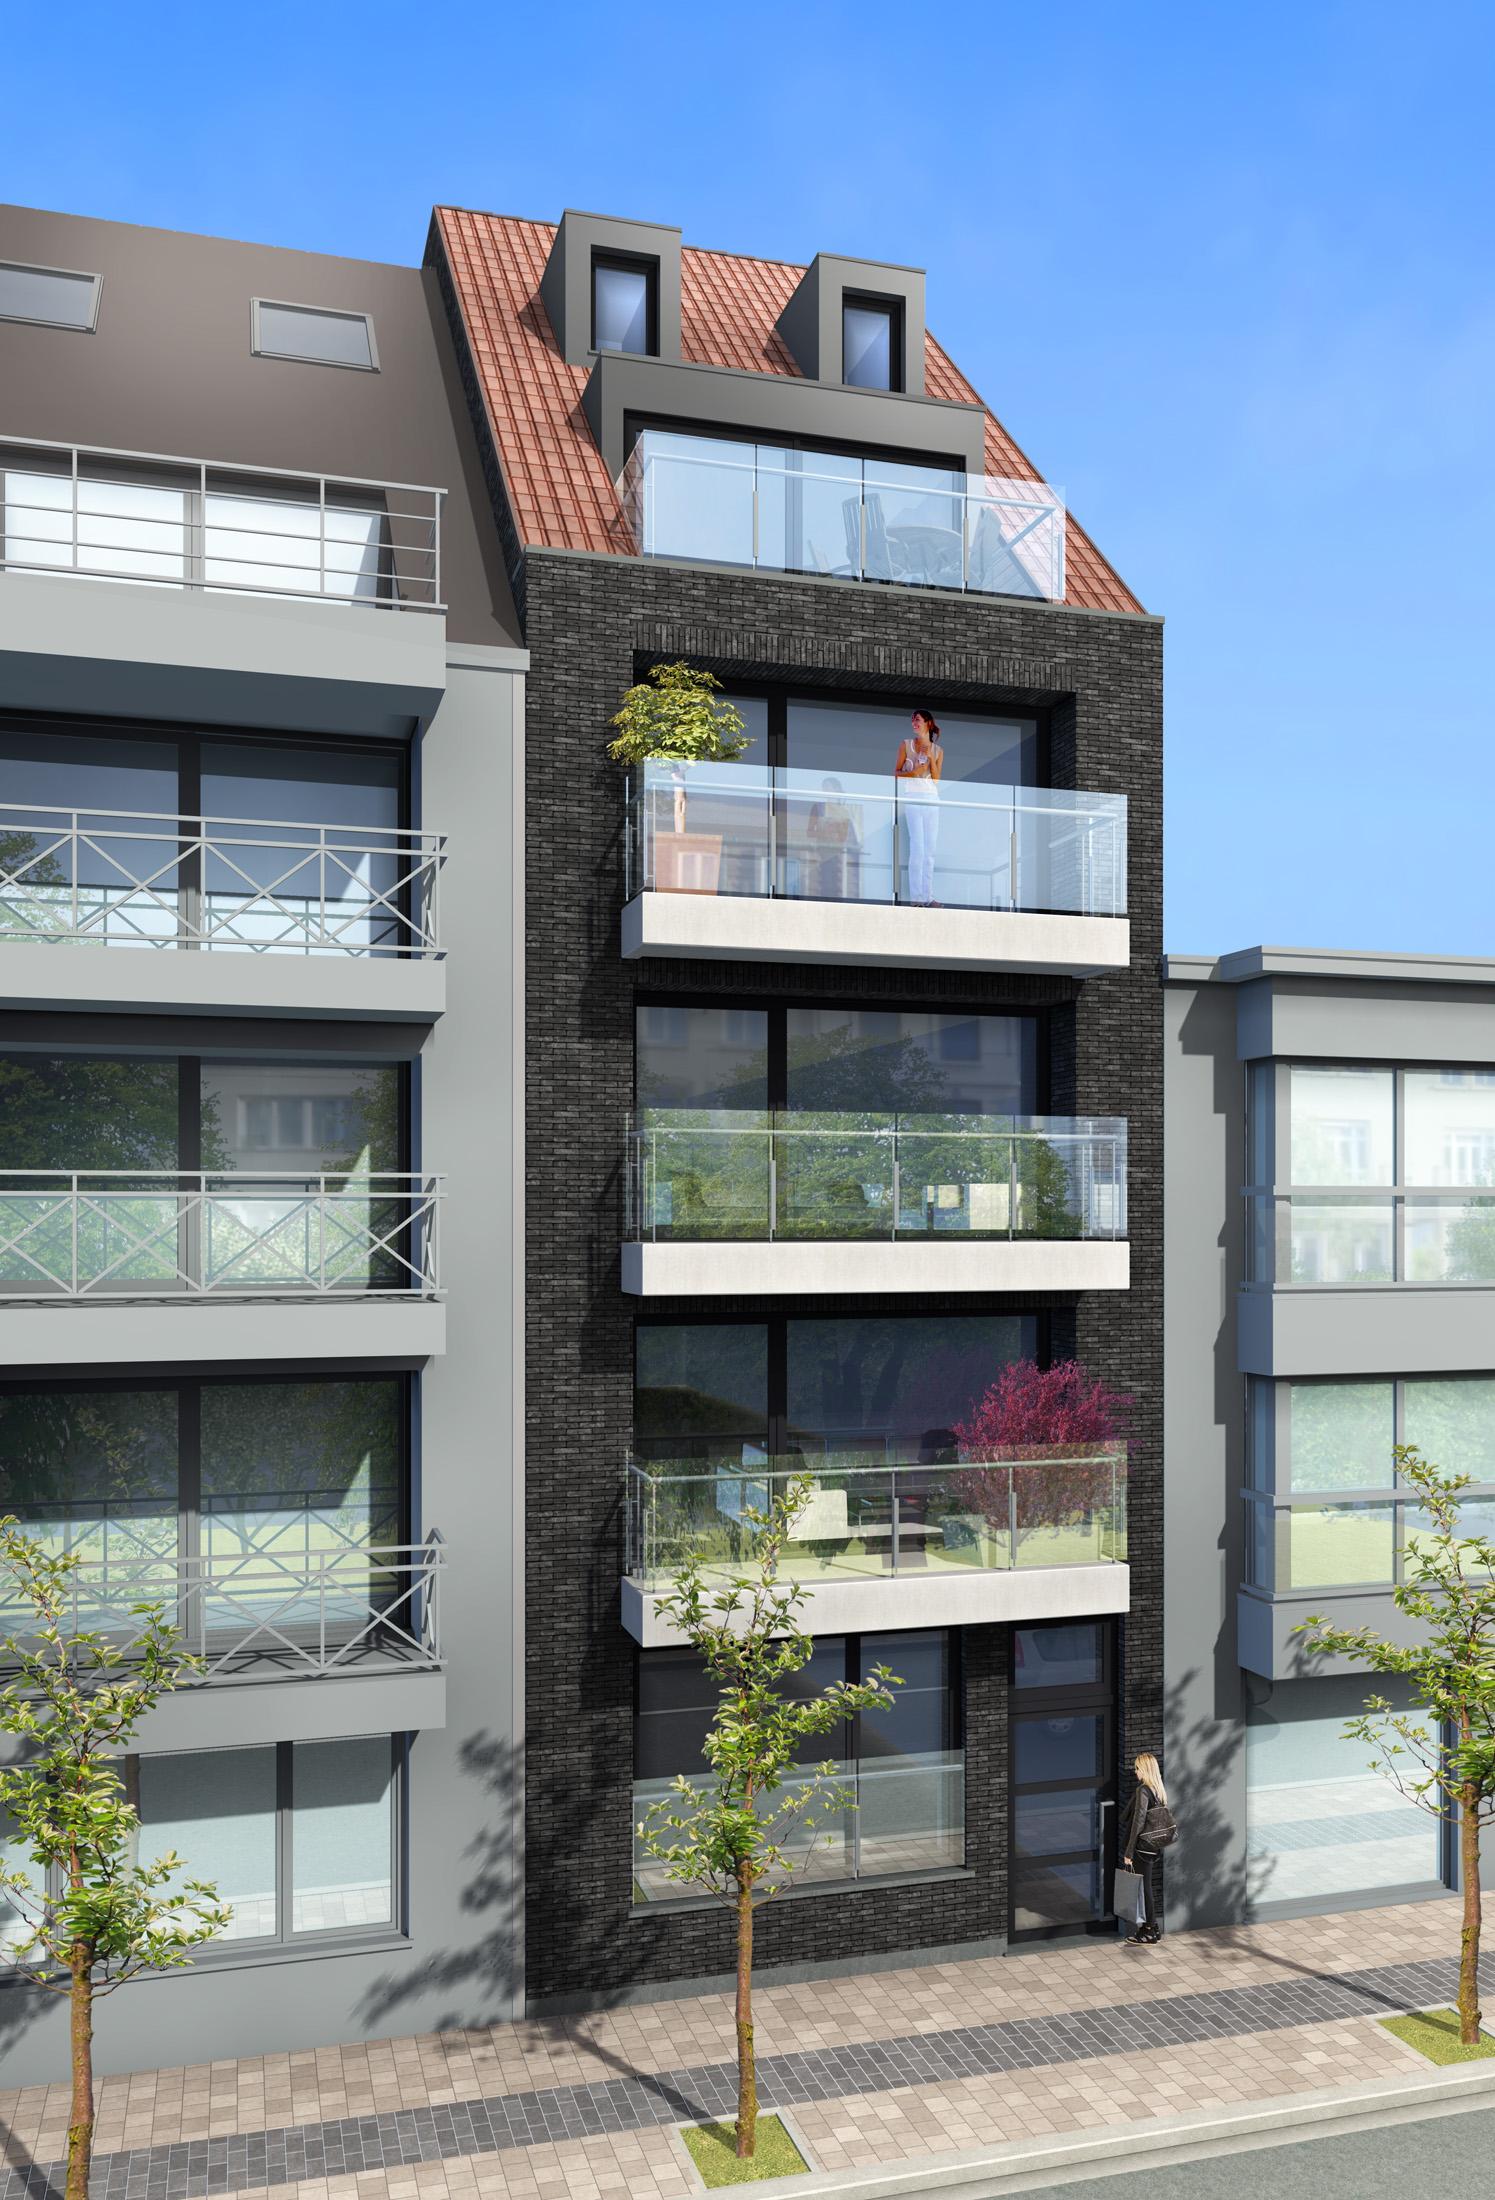 Appartement met 2 slaapkamers te koop in Knokke-Heist (8300) - Zimmo